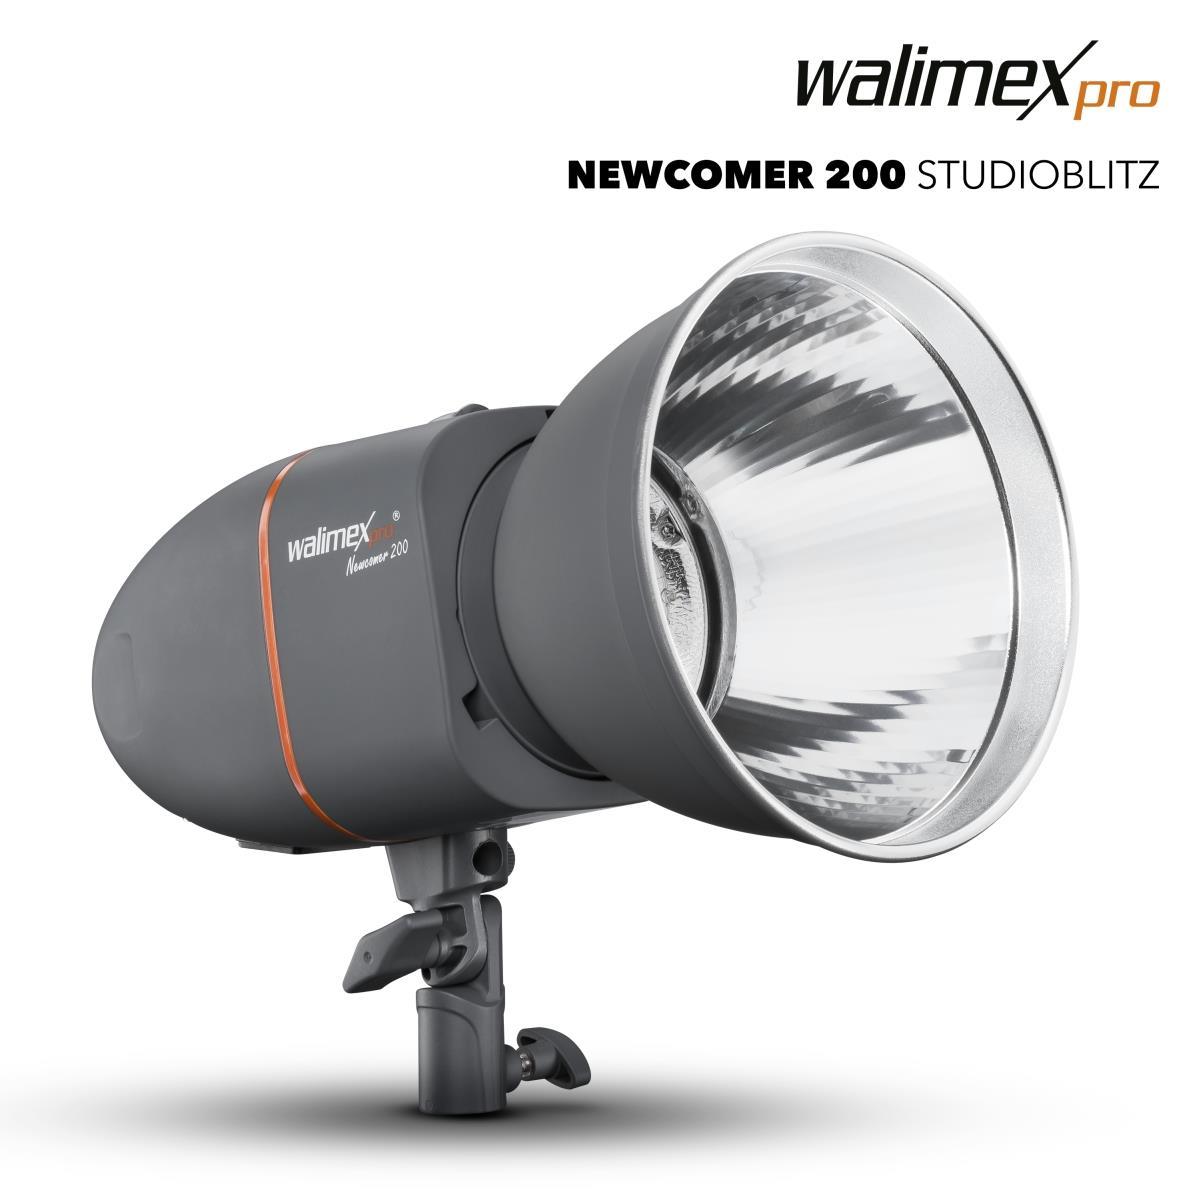 Walimex pro Newcomer 200 Studioblitz